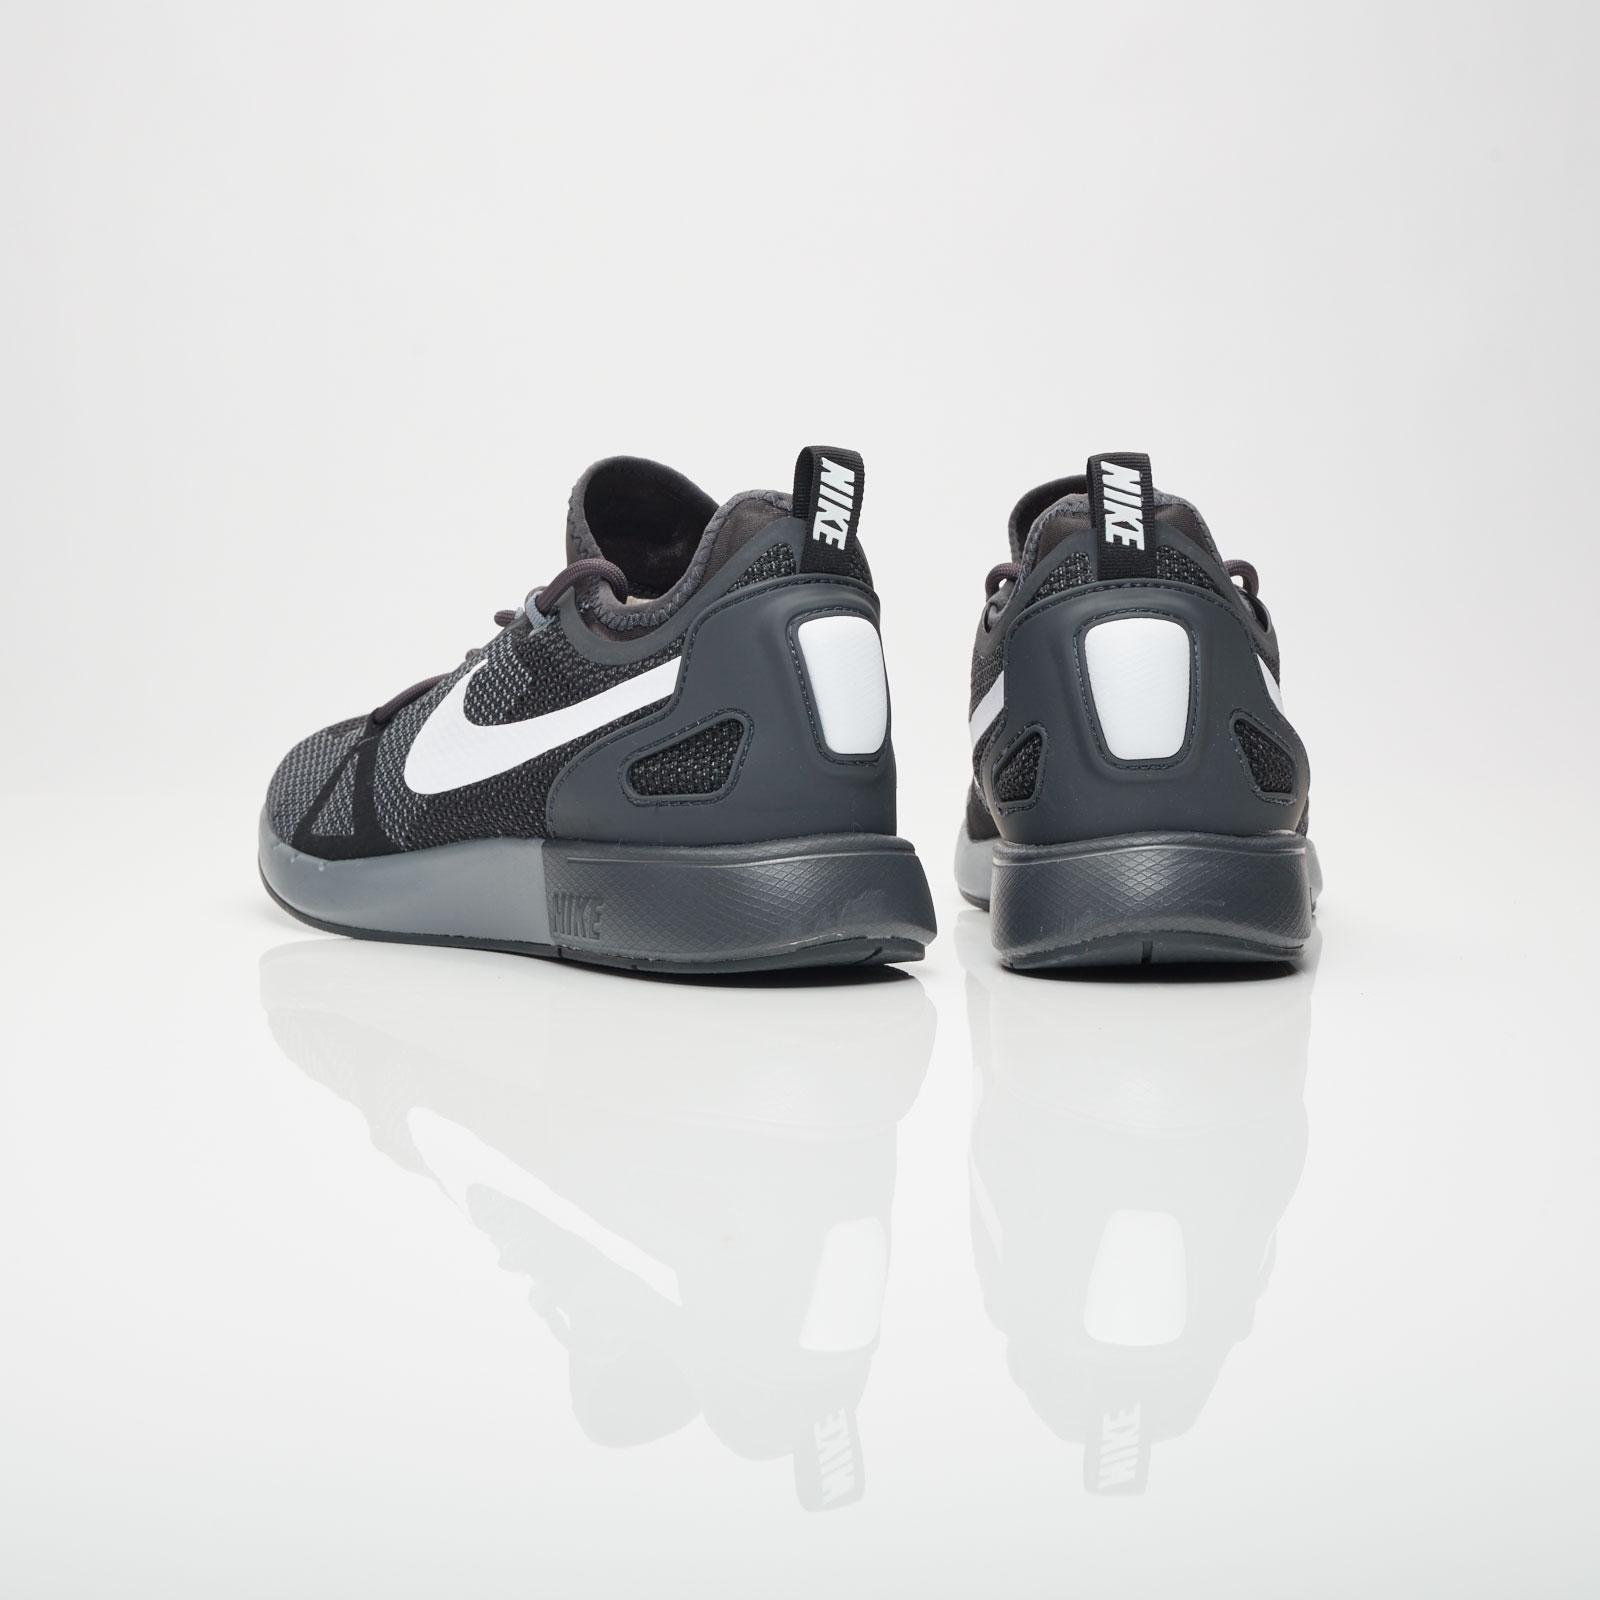 Nike Running Duel Racer Nike Running Duel Racer ... 7703d6432